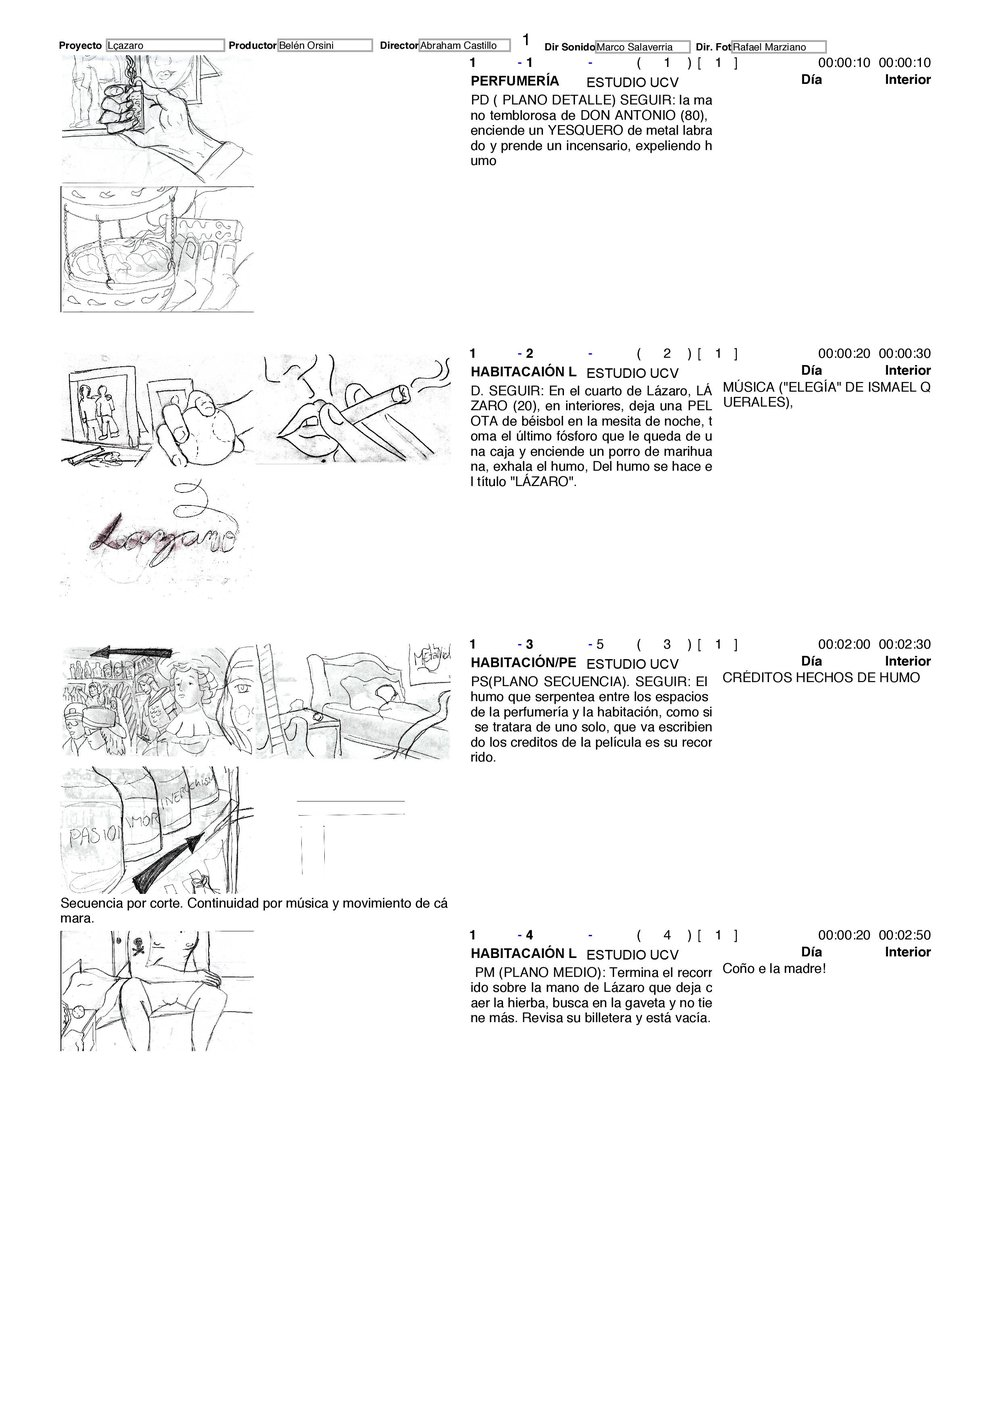 Lázaro historyboard-1.jpg